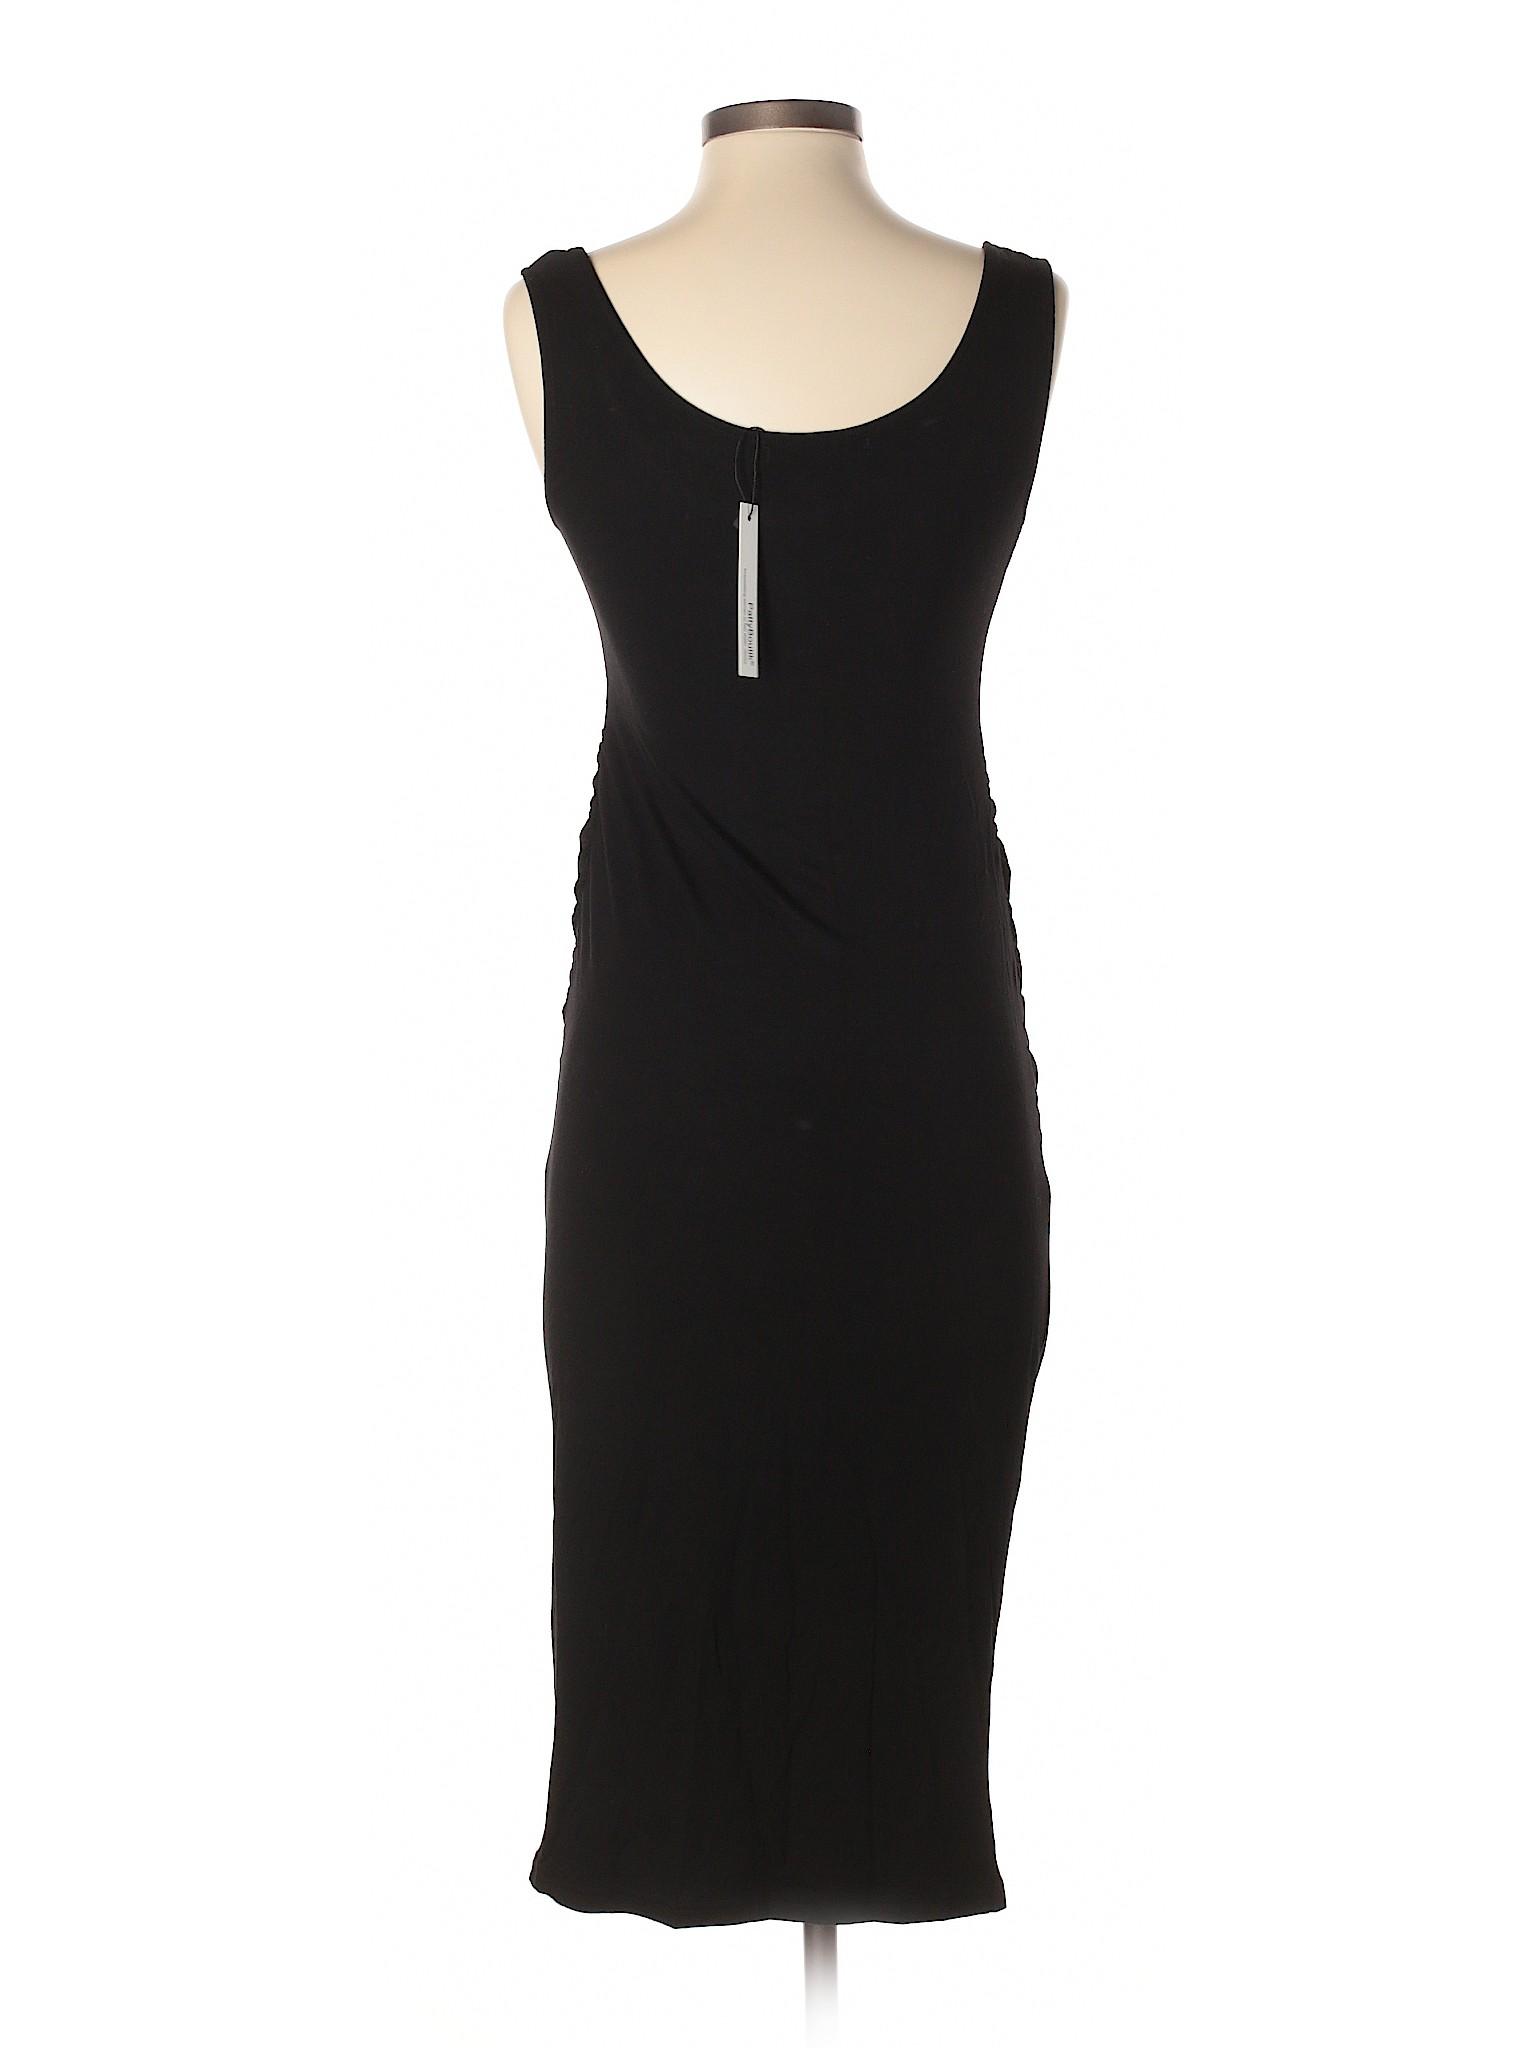 Boutik Dress Boutique Casual Patty winter Ewq76Hg